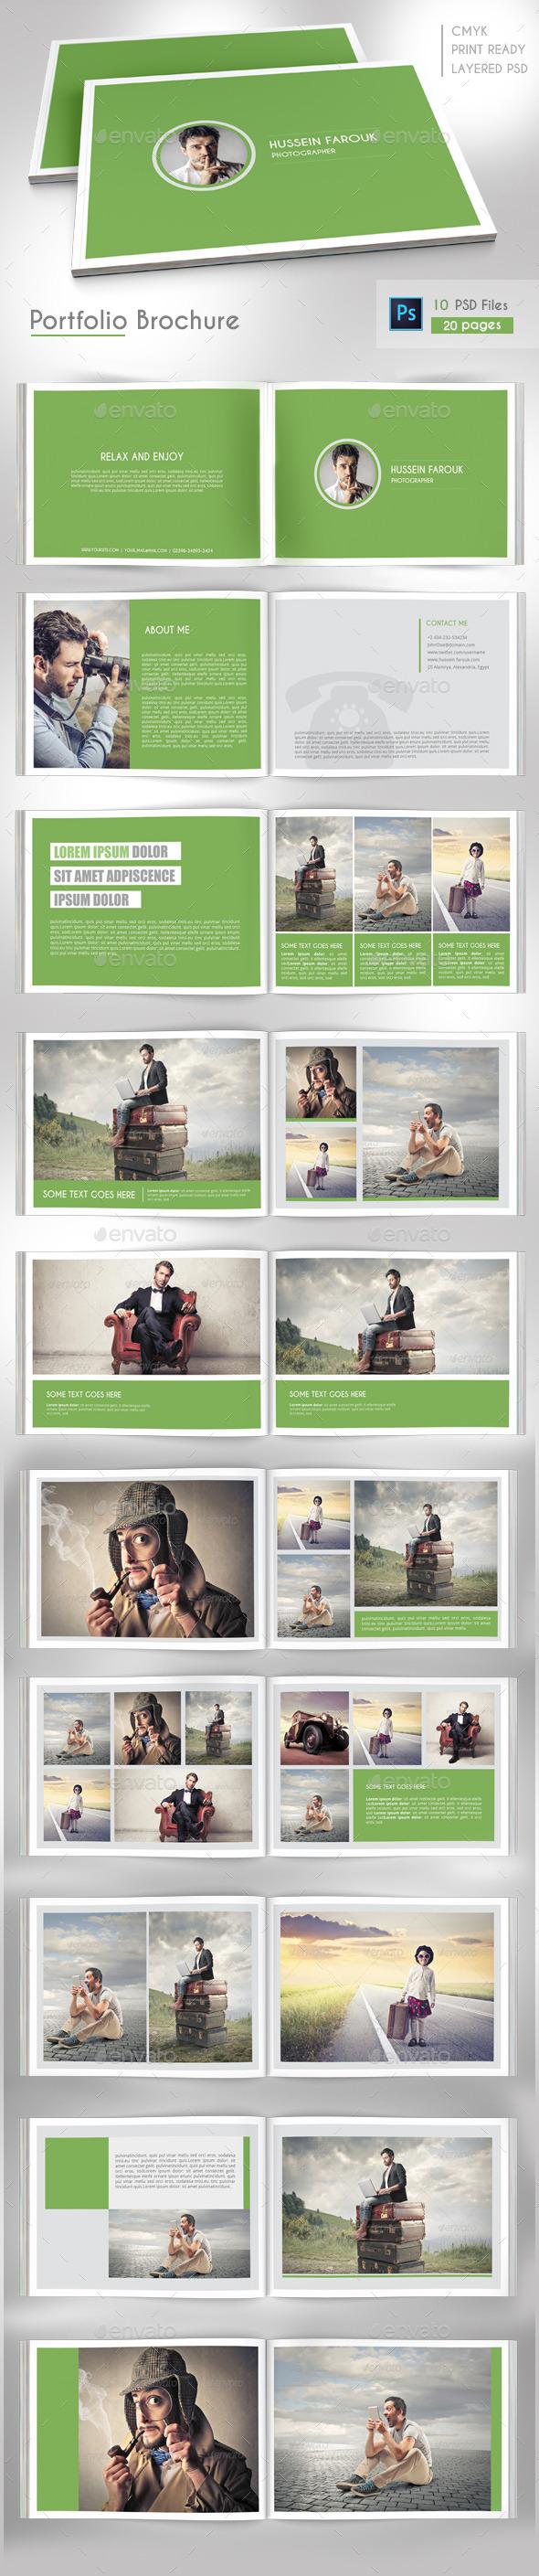 Portfolio Brochure Vol 1 - Portfolio Brochures